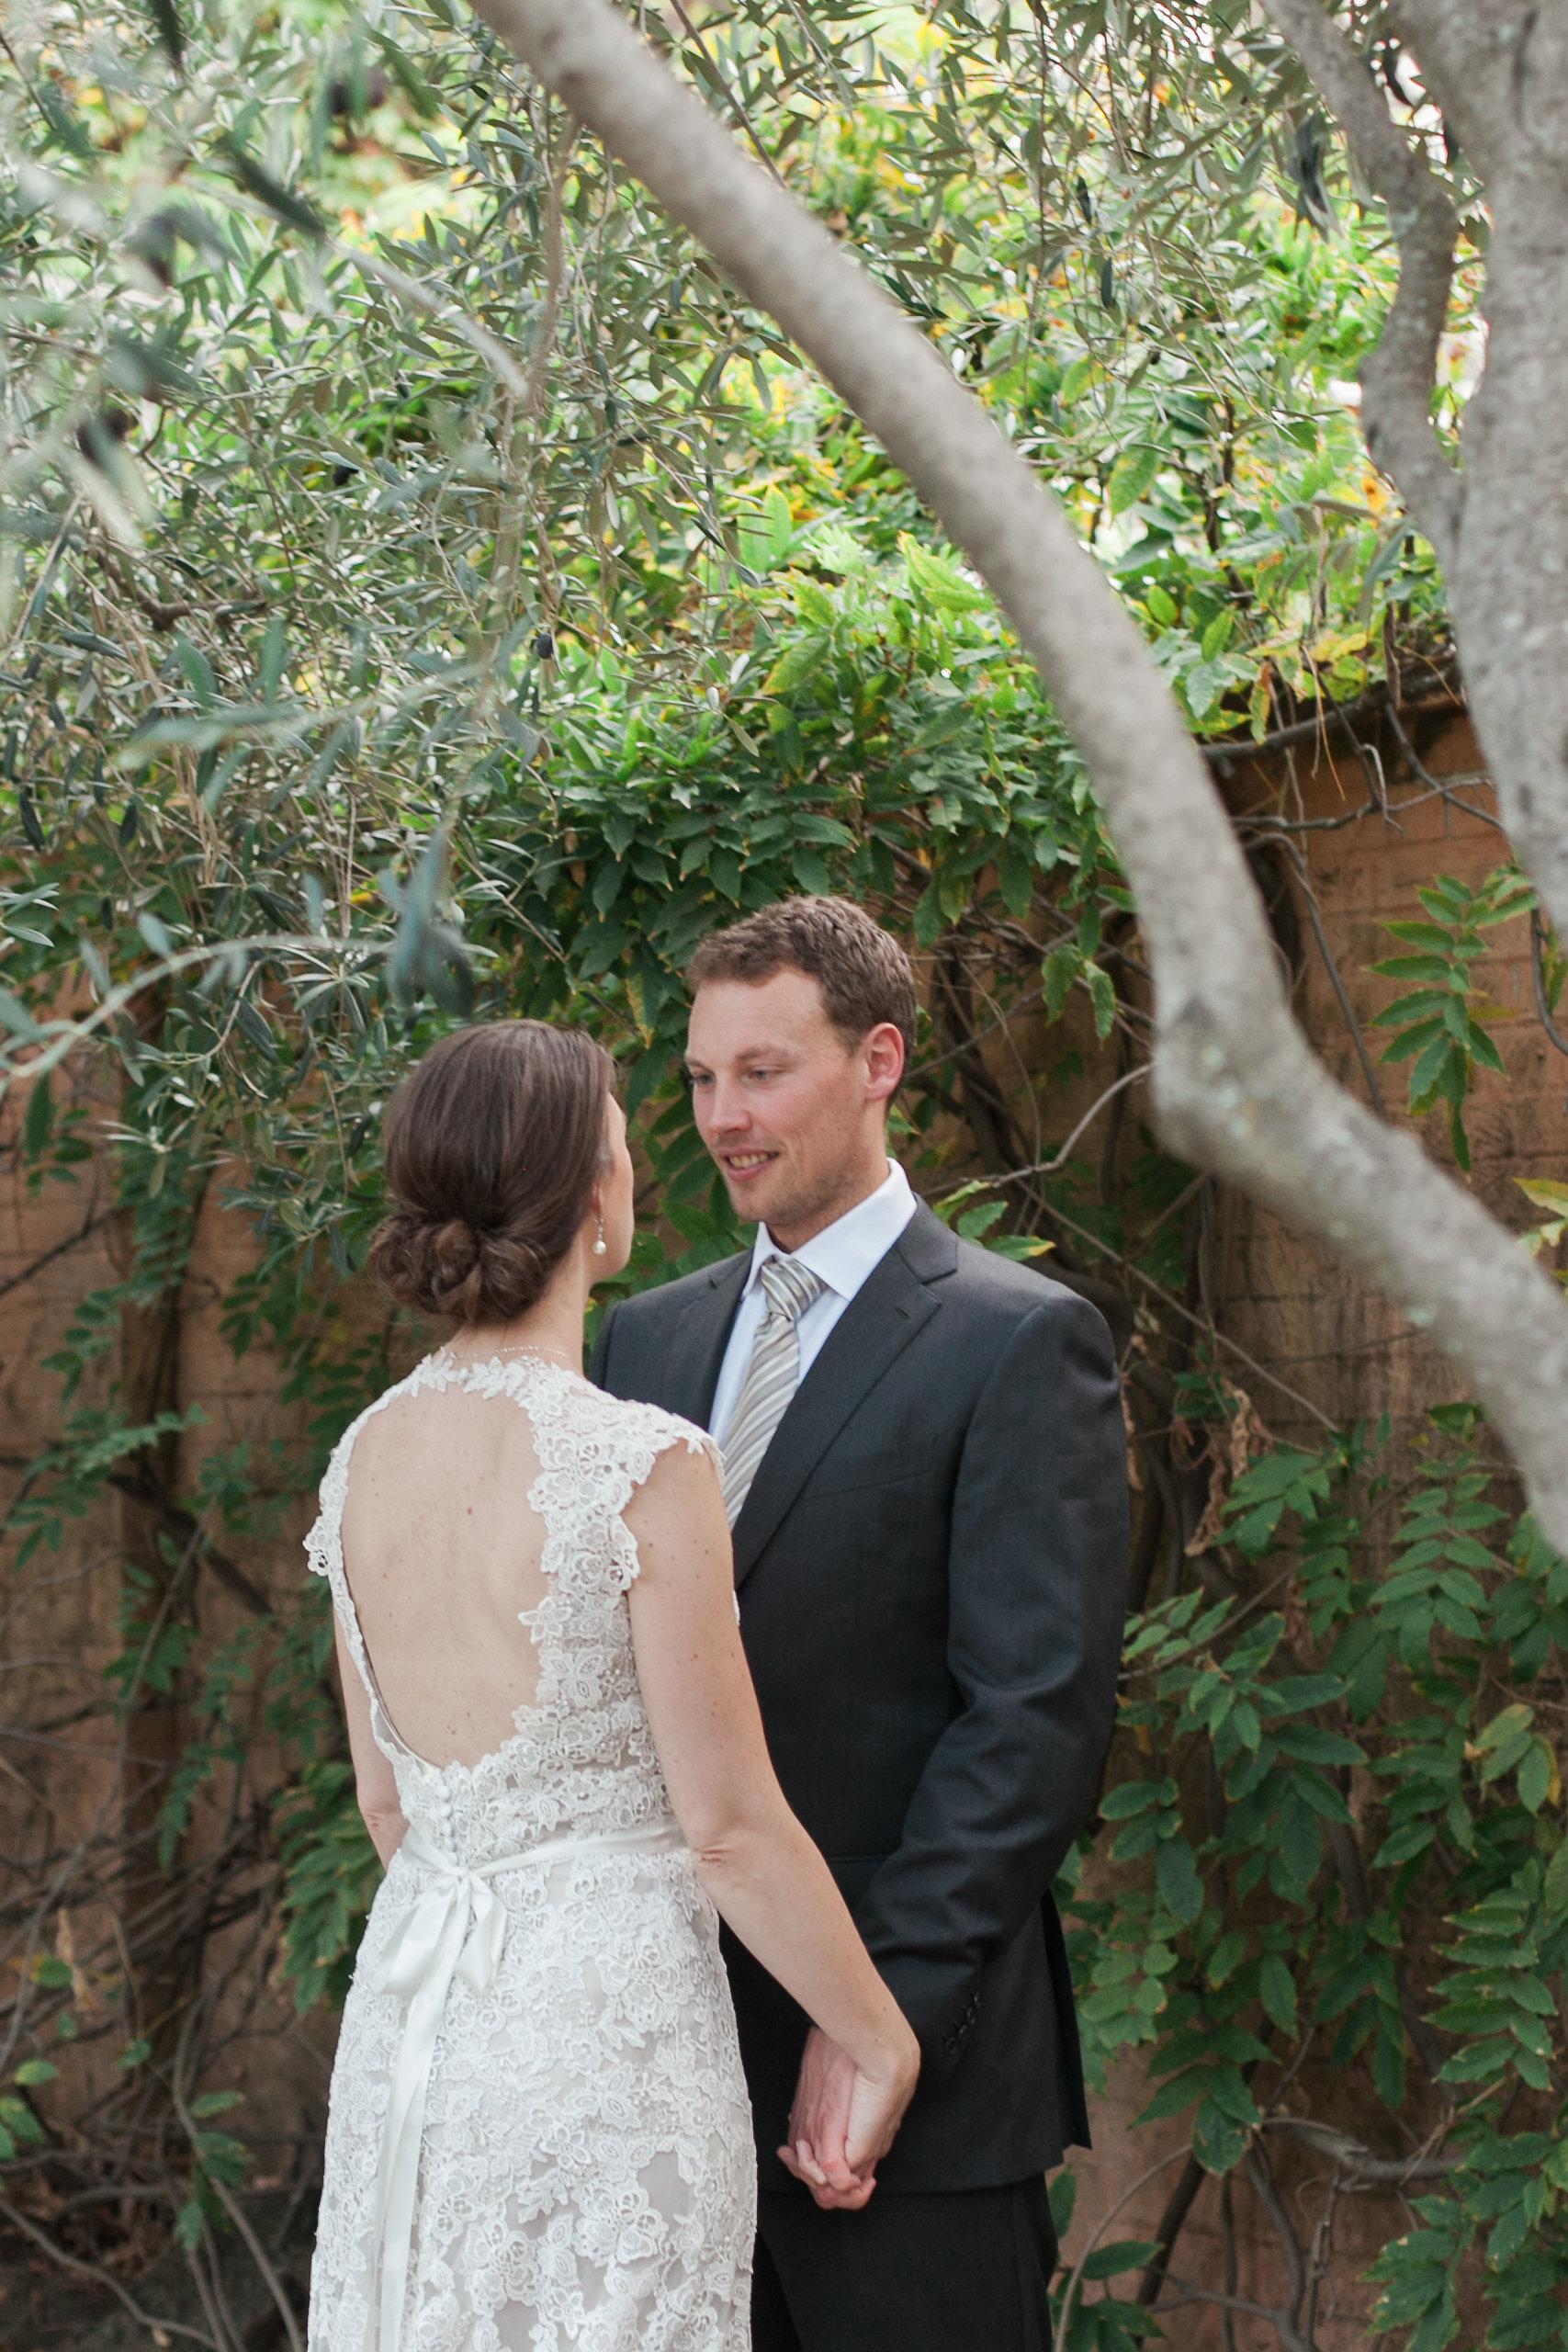 GetmarriedinYountville-weddingphotographer-57.jpg